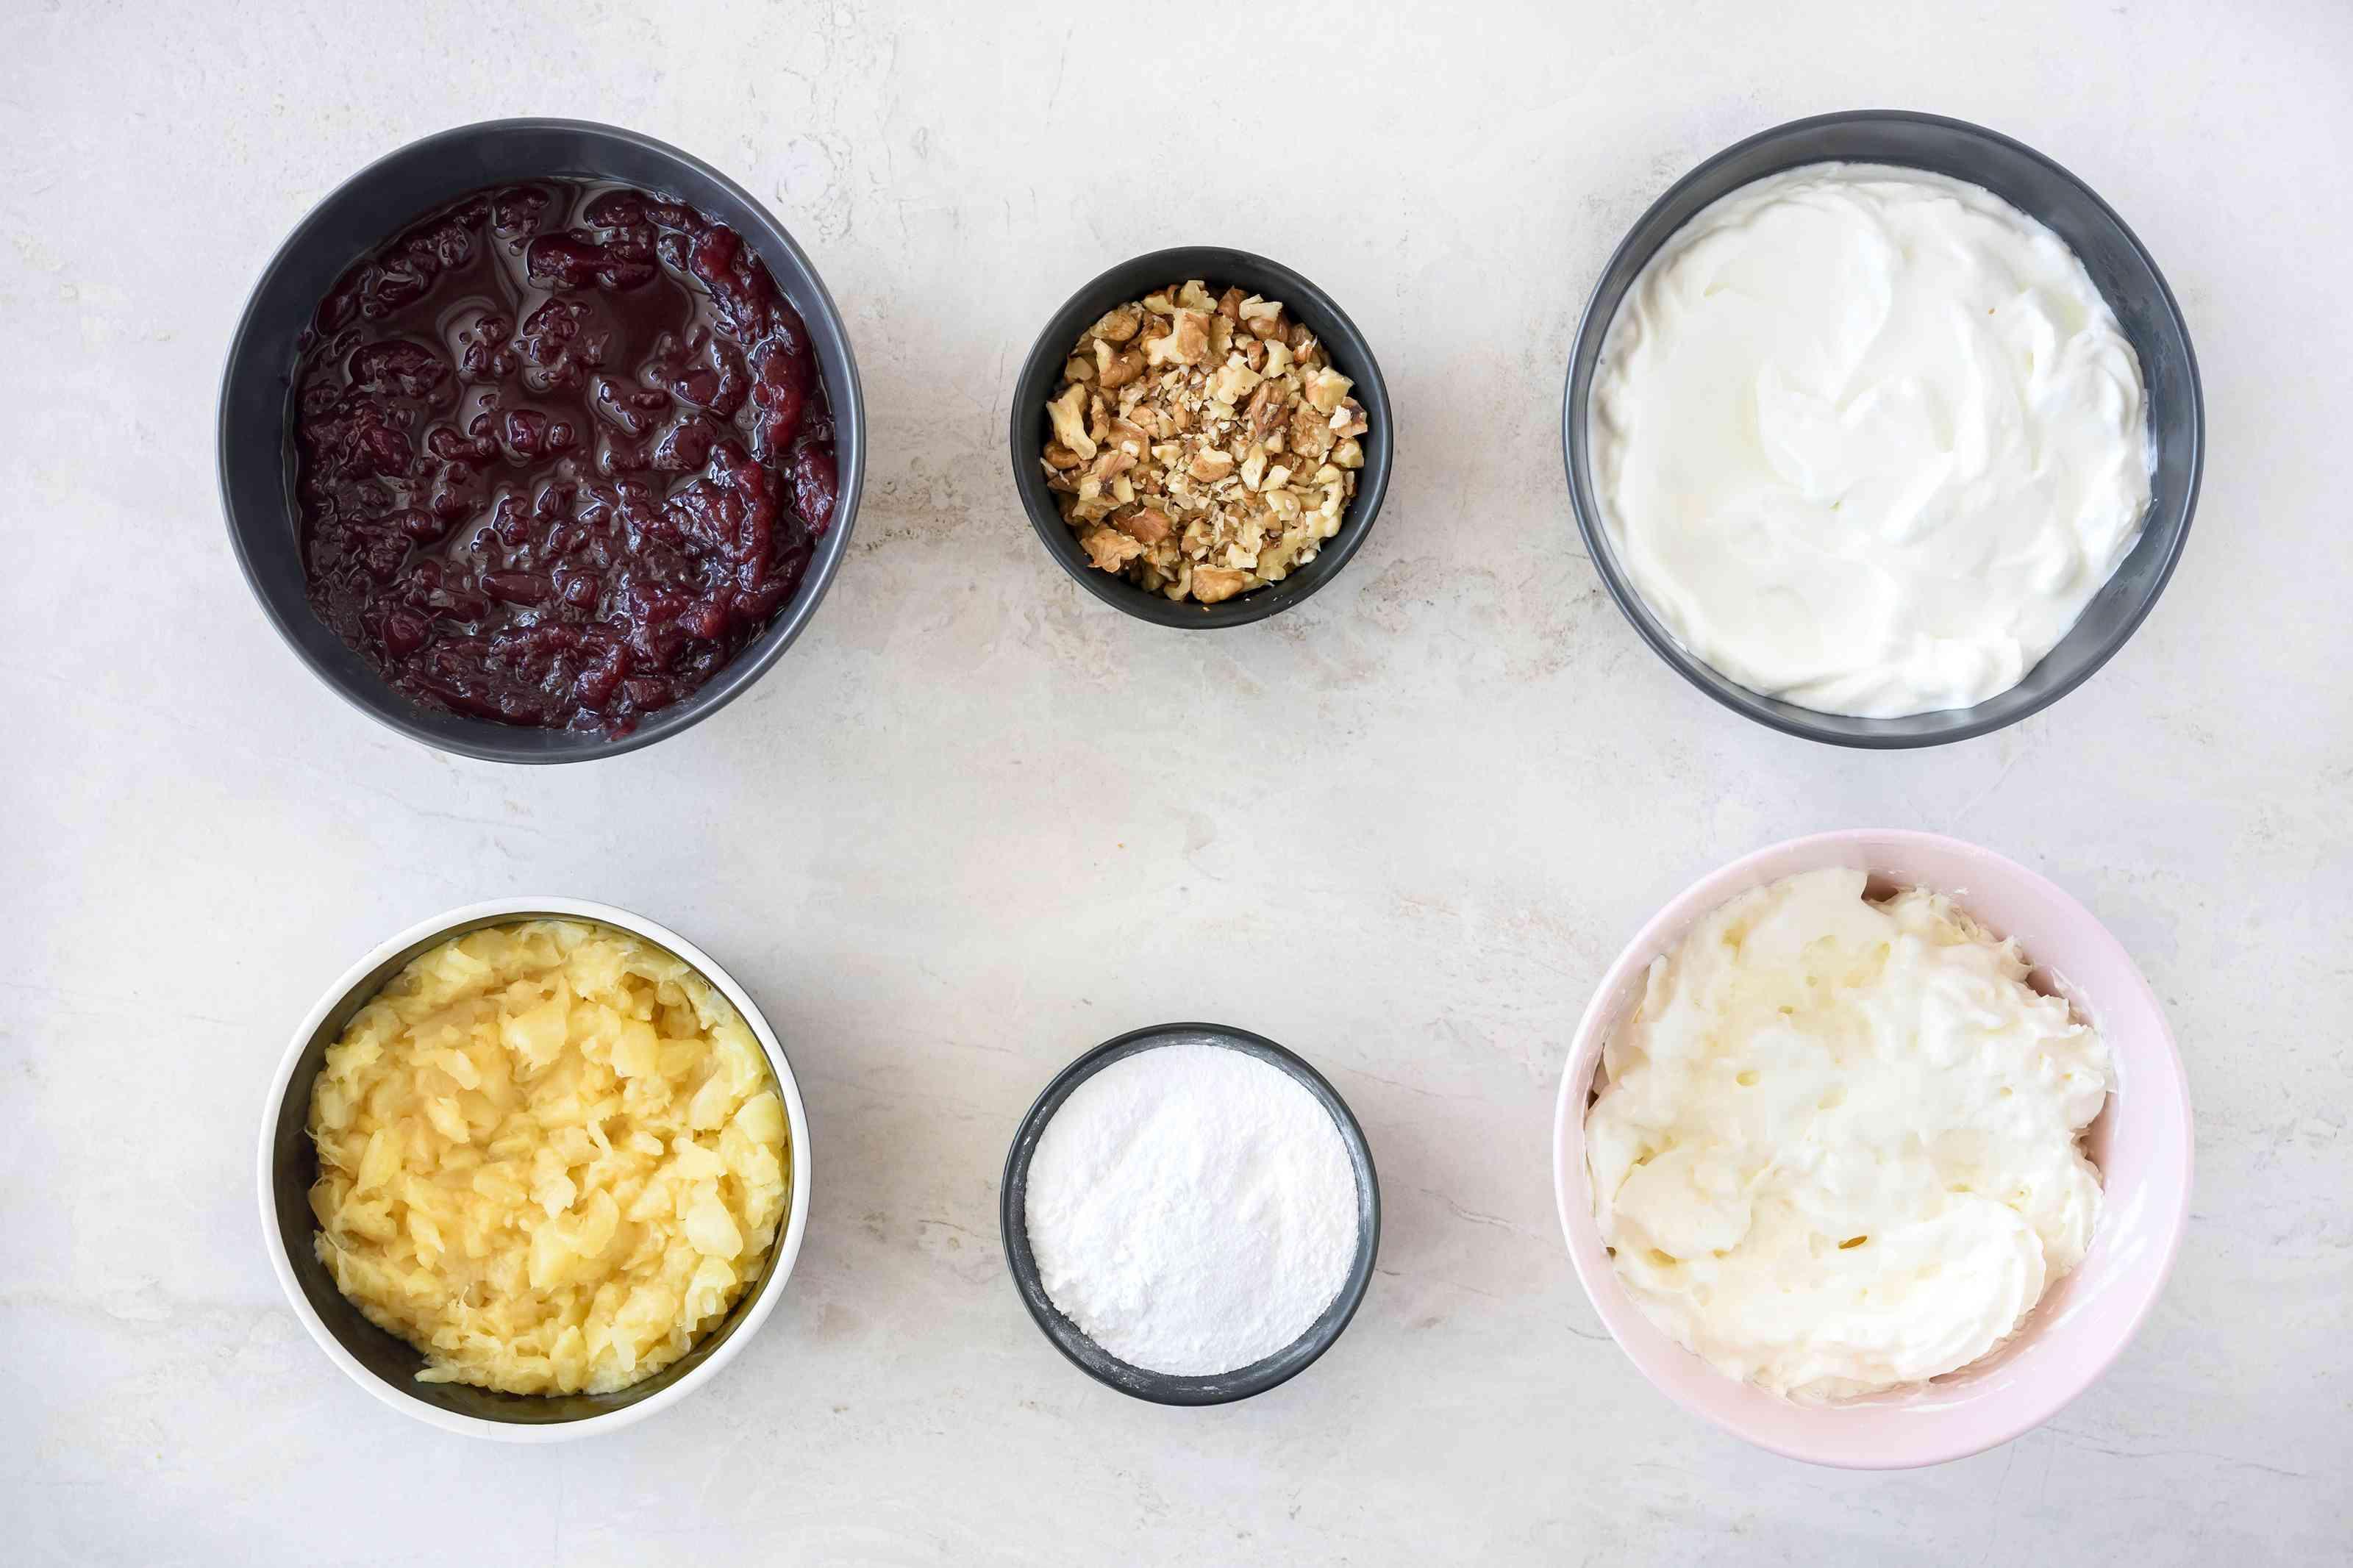 Ingredients for frozen pineapple cranberry salad